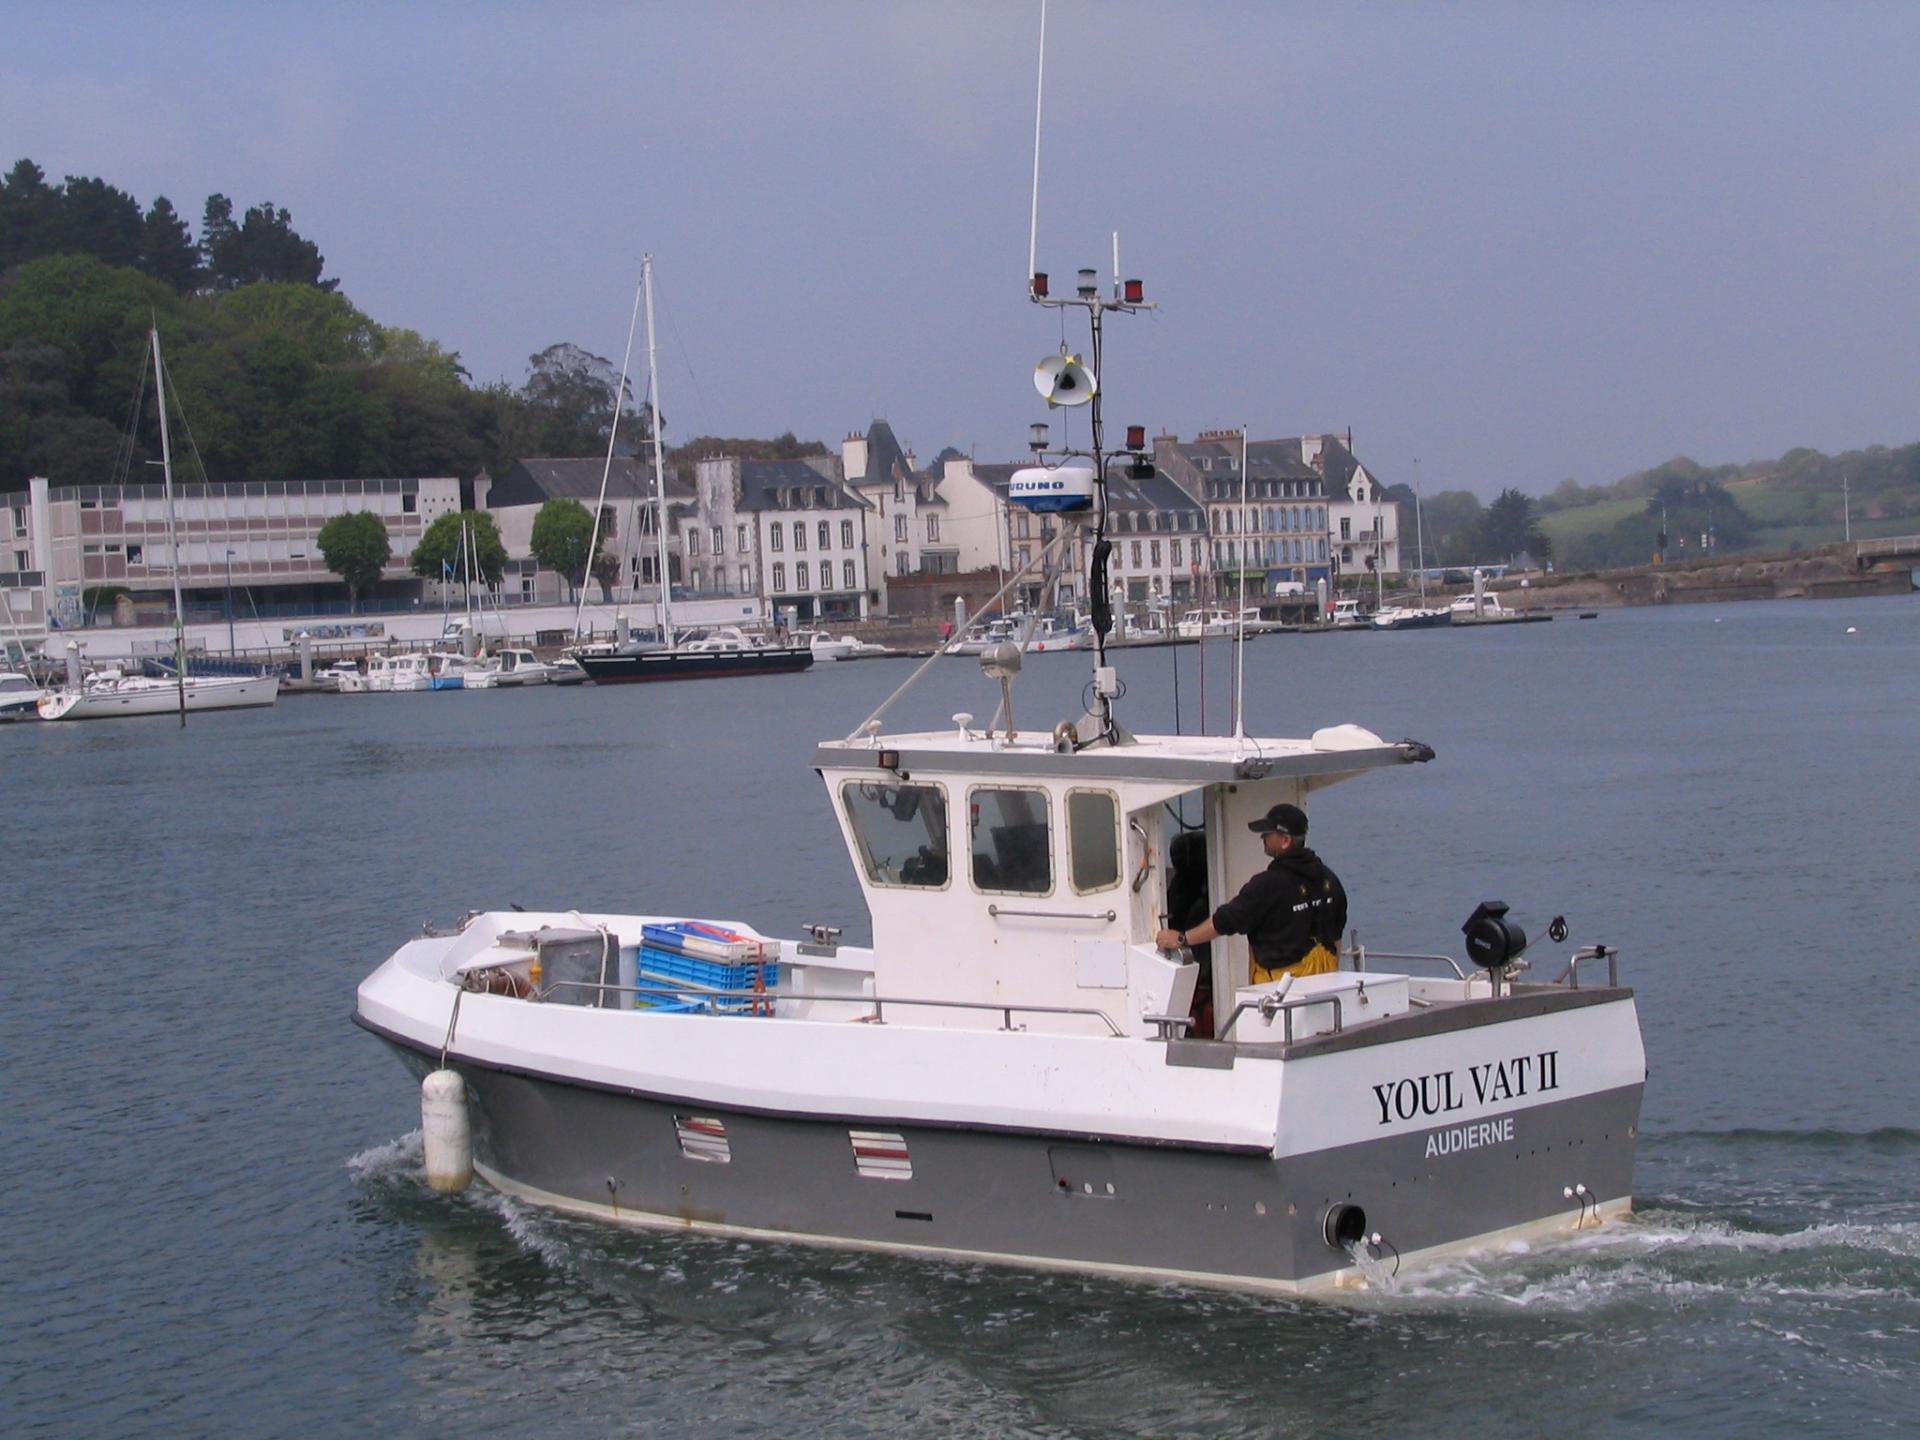 200423 youl vat ii port k